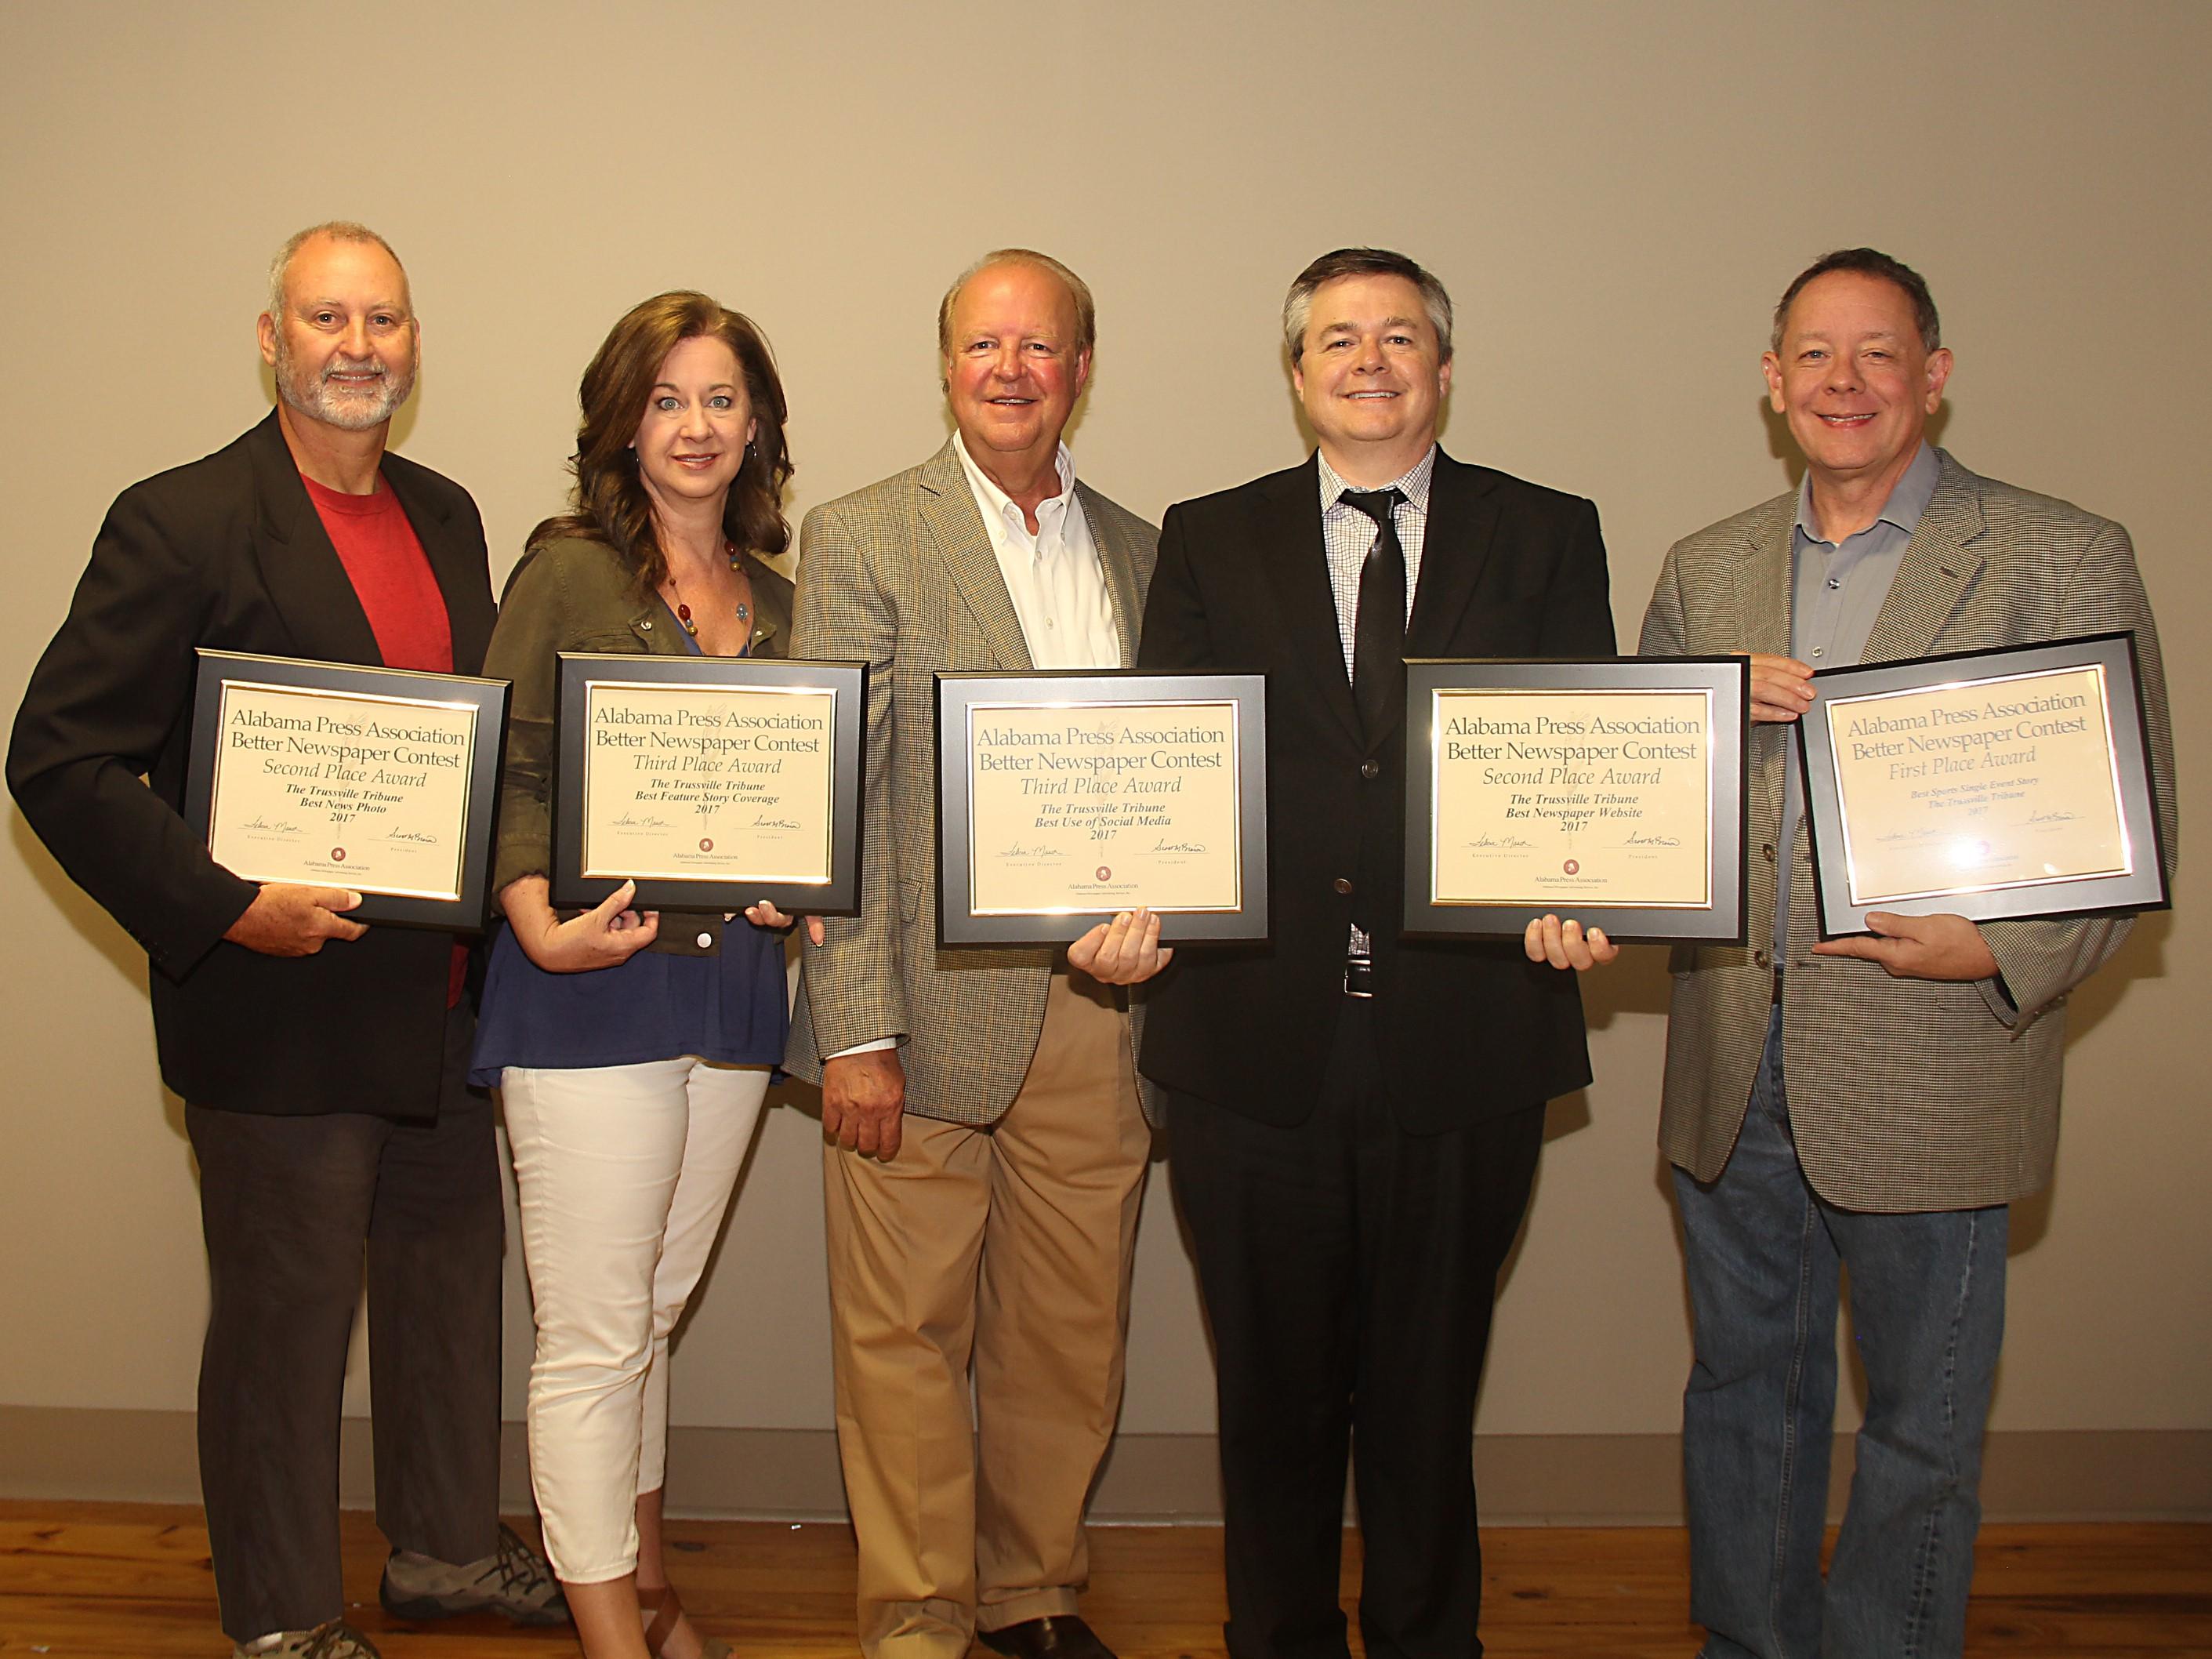 The Trussville Tribune wins five awards from Alabama Press Association